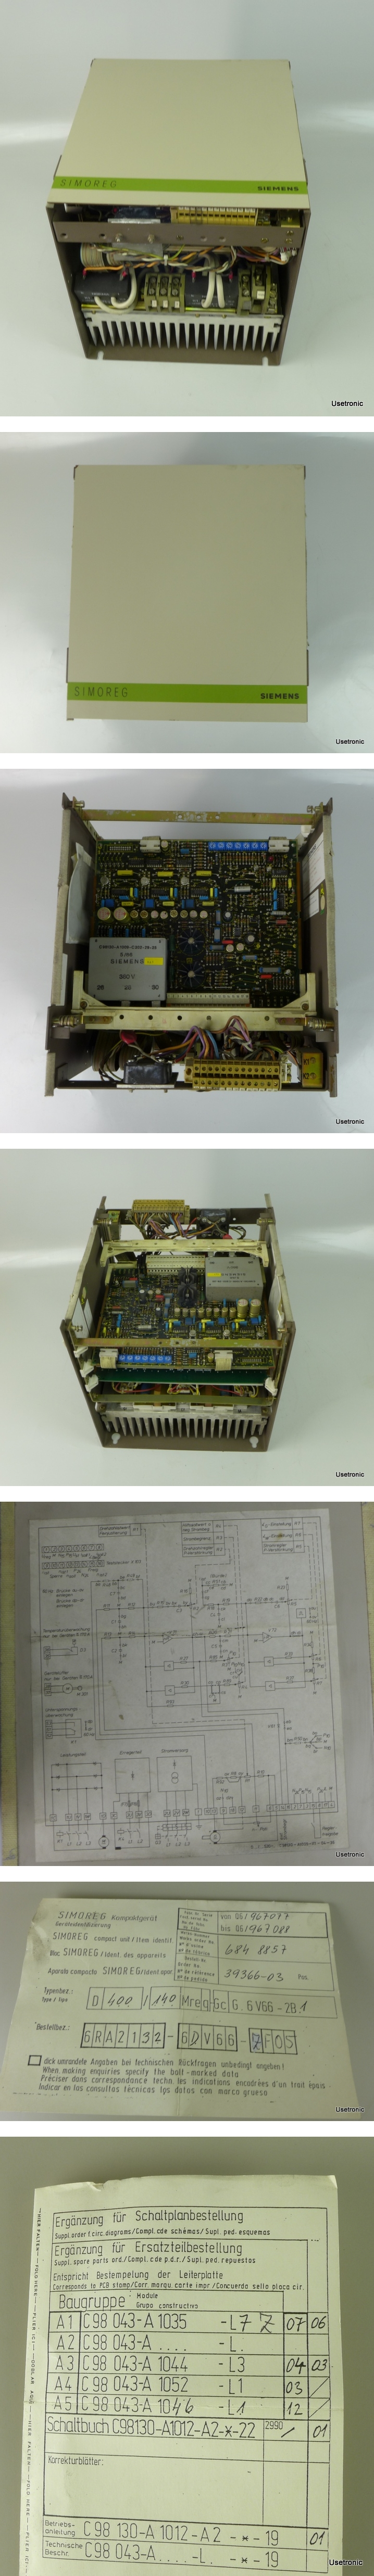 Siemens 6RA2132-6DV66